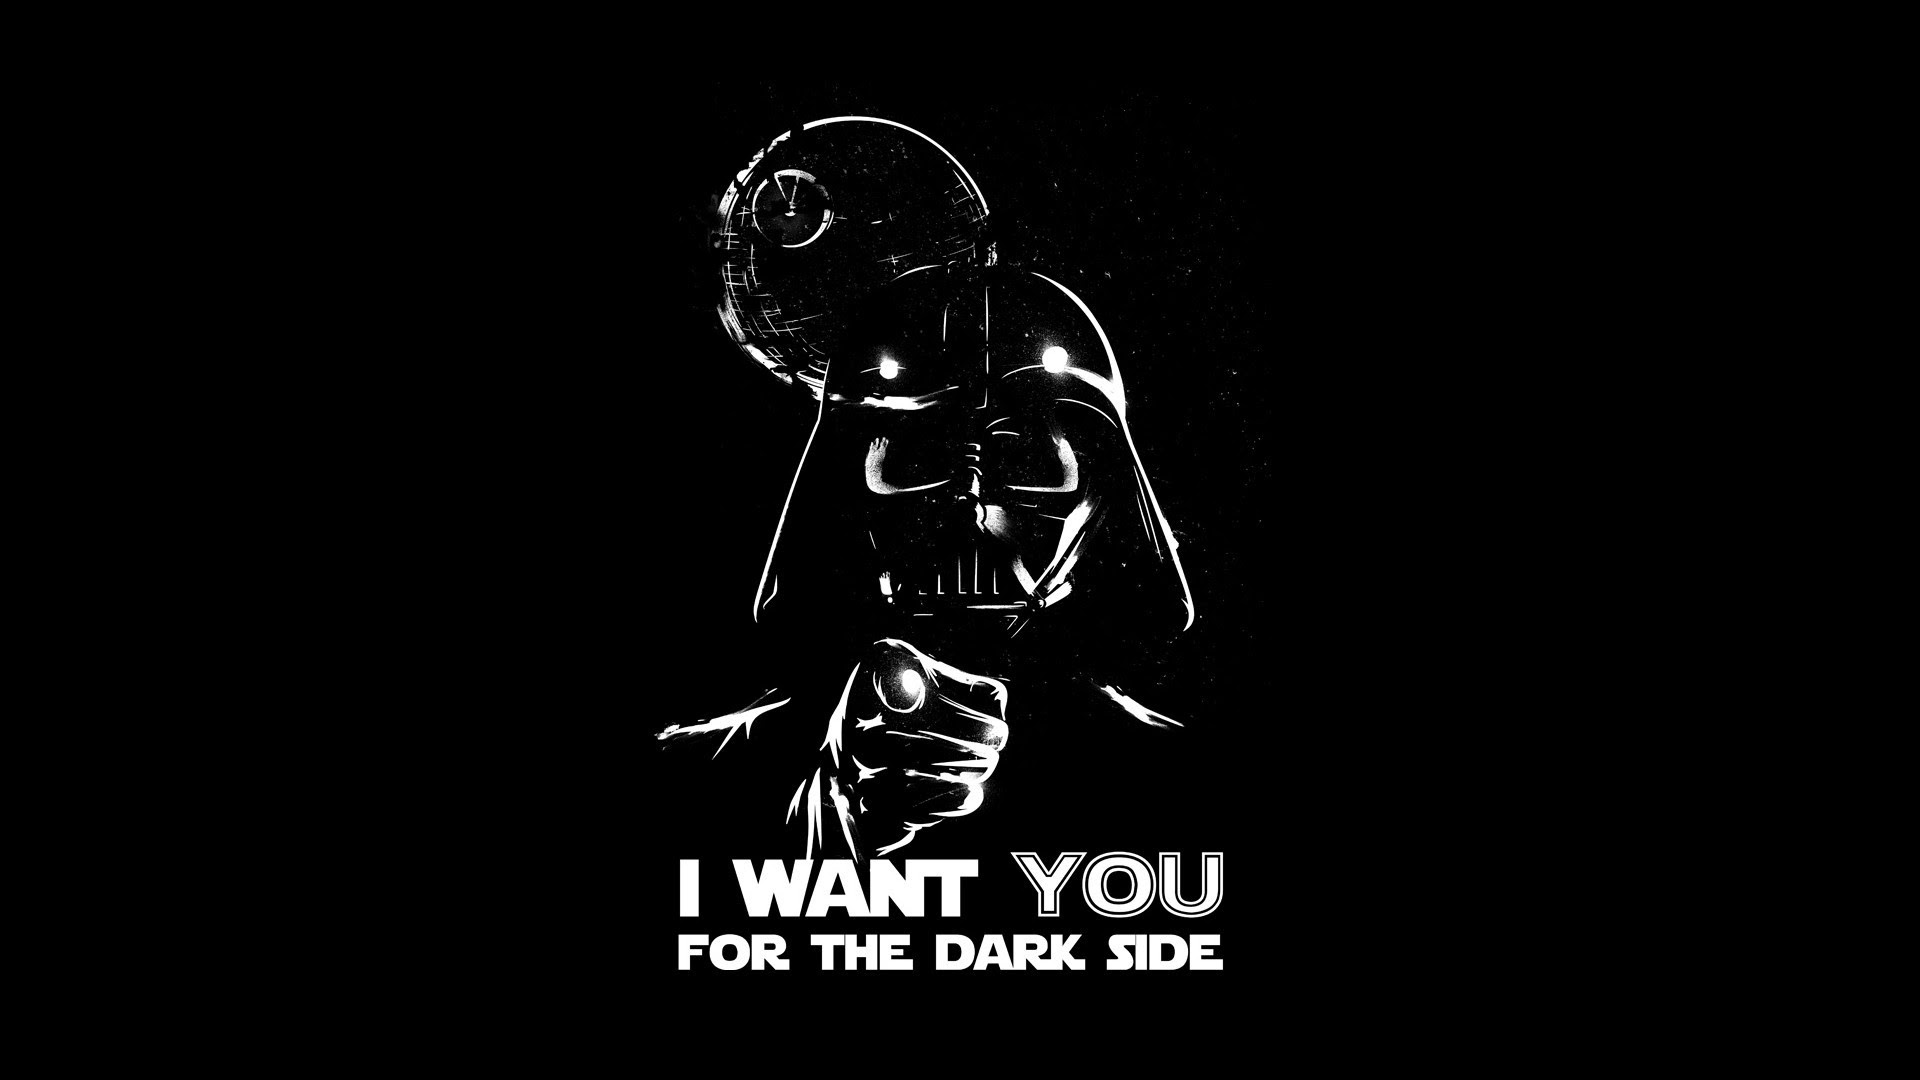 Darth Vader Wallpaper Hd Best Collection Of Anakin Skywalker 1920x1080